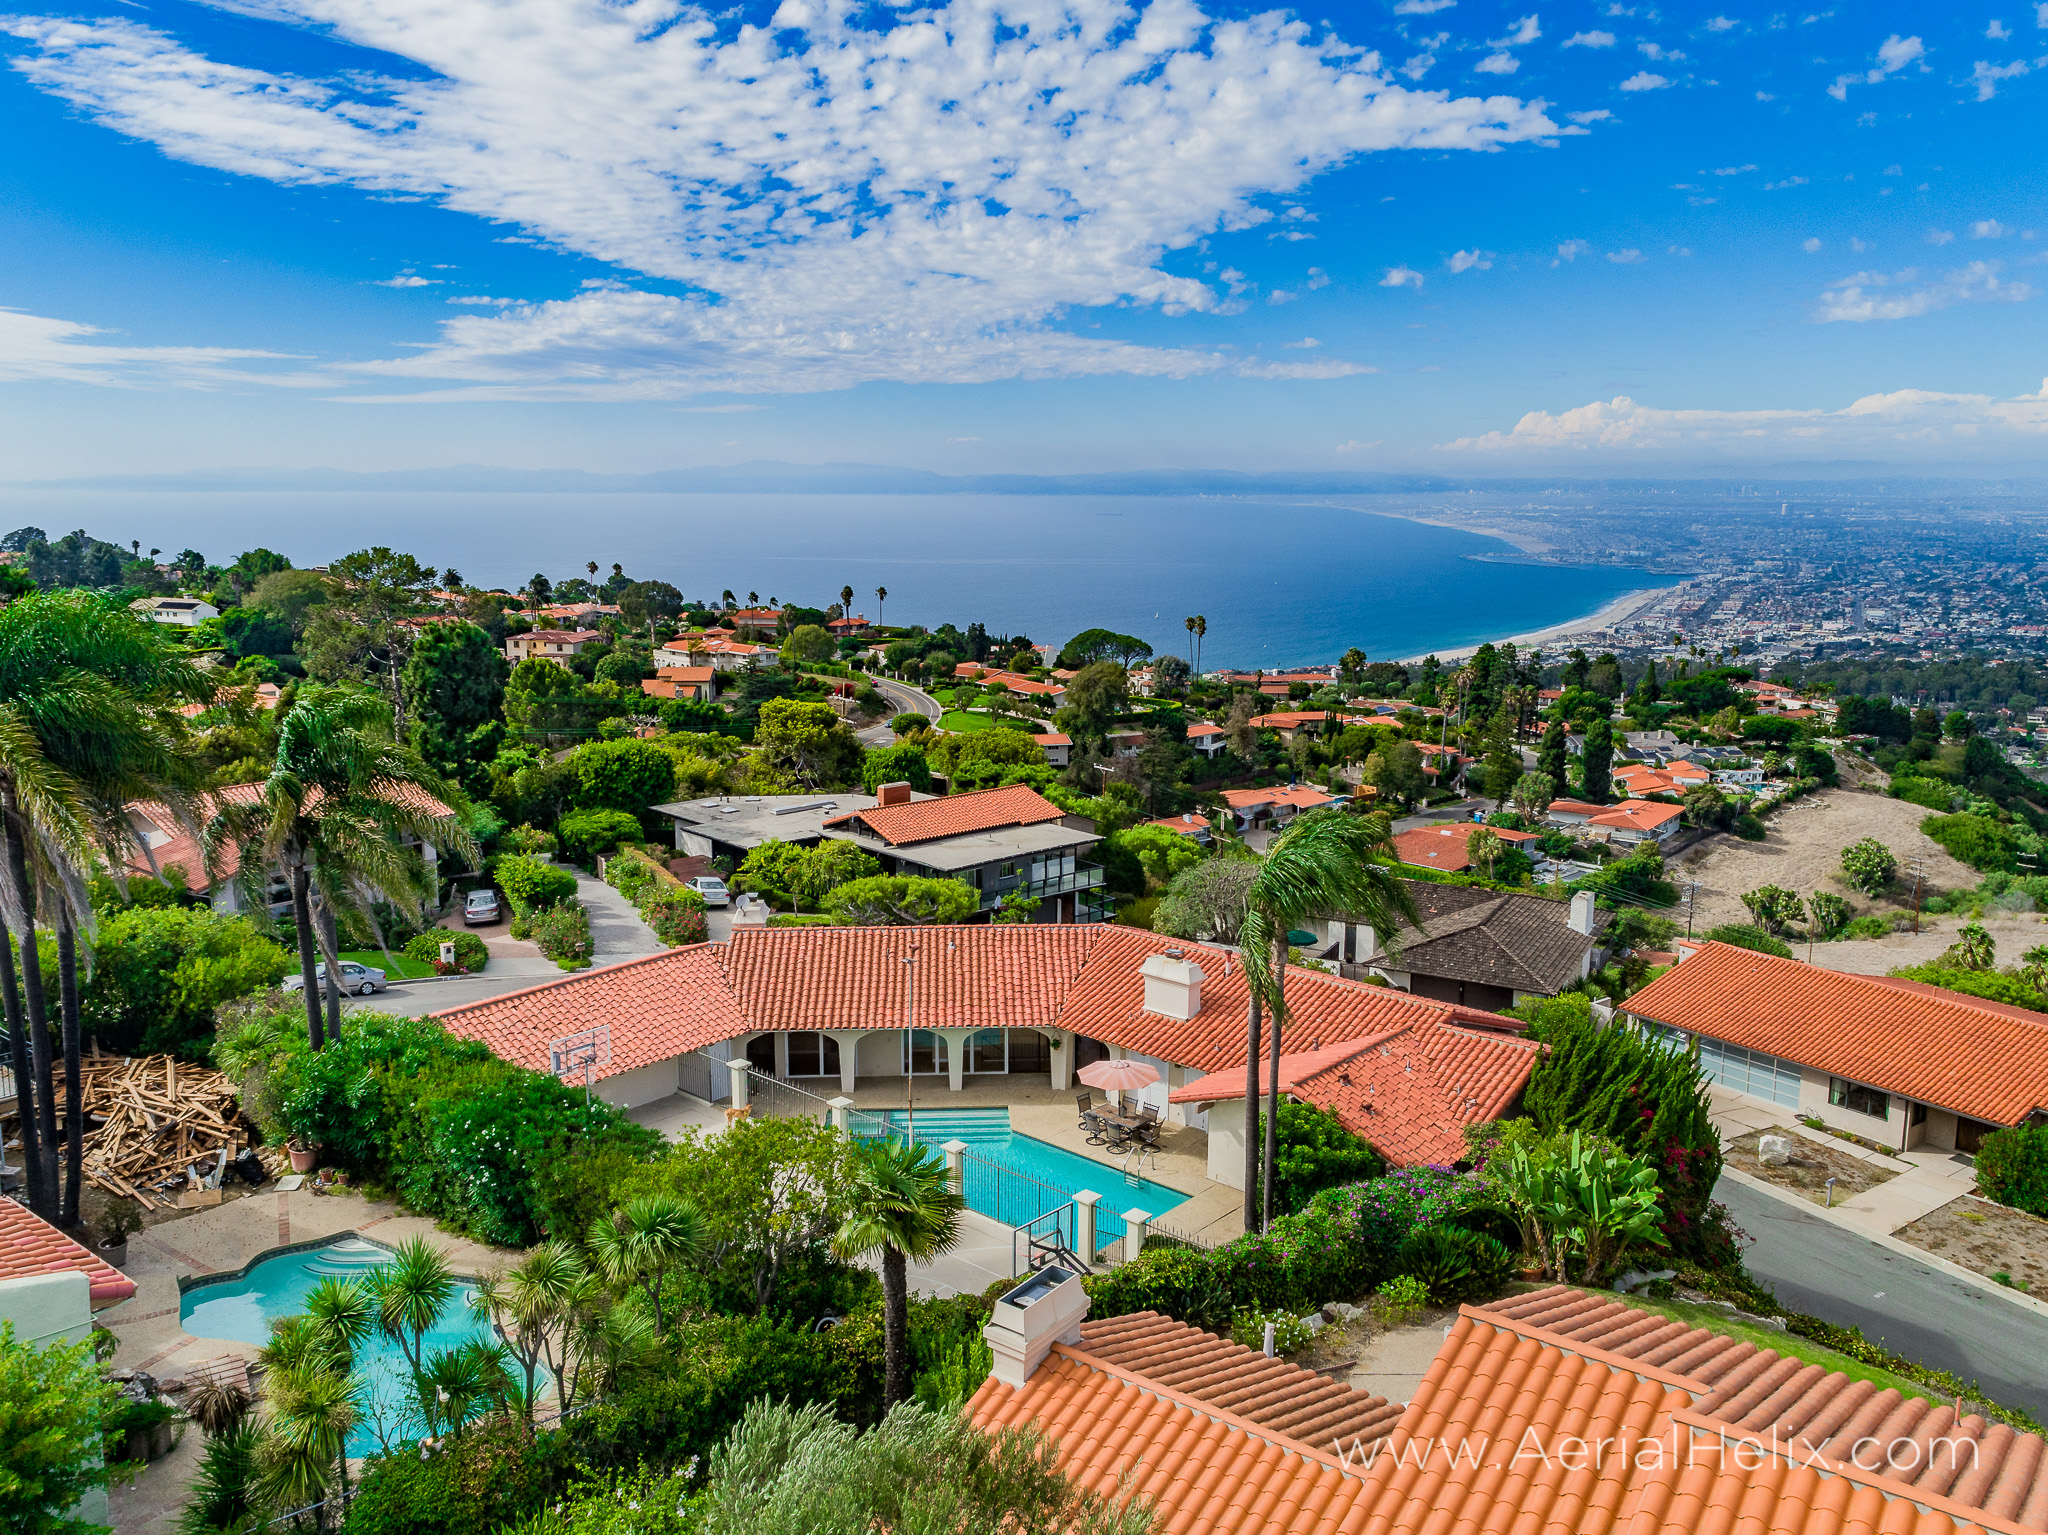 Woodfern Drive - HELIX Real Estate Aerial Photographer-42.jpg